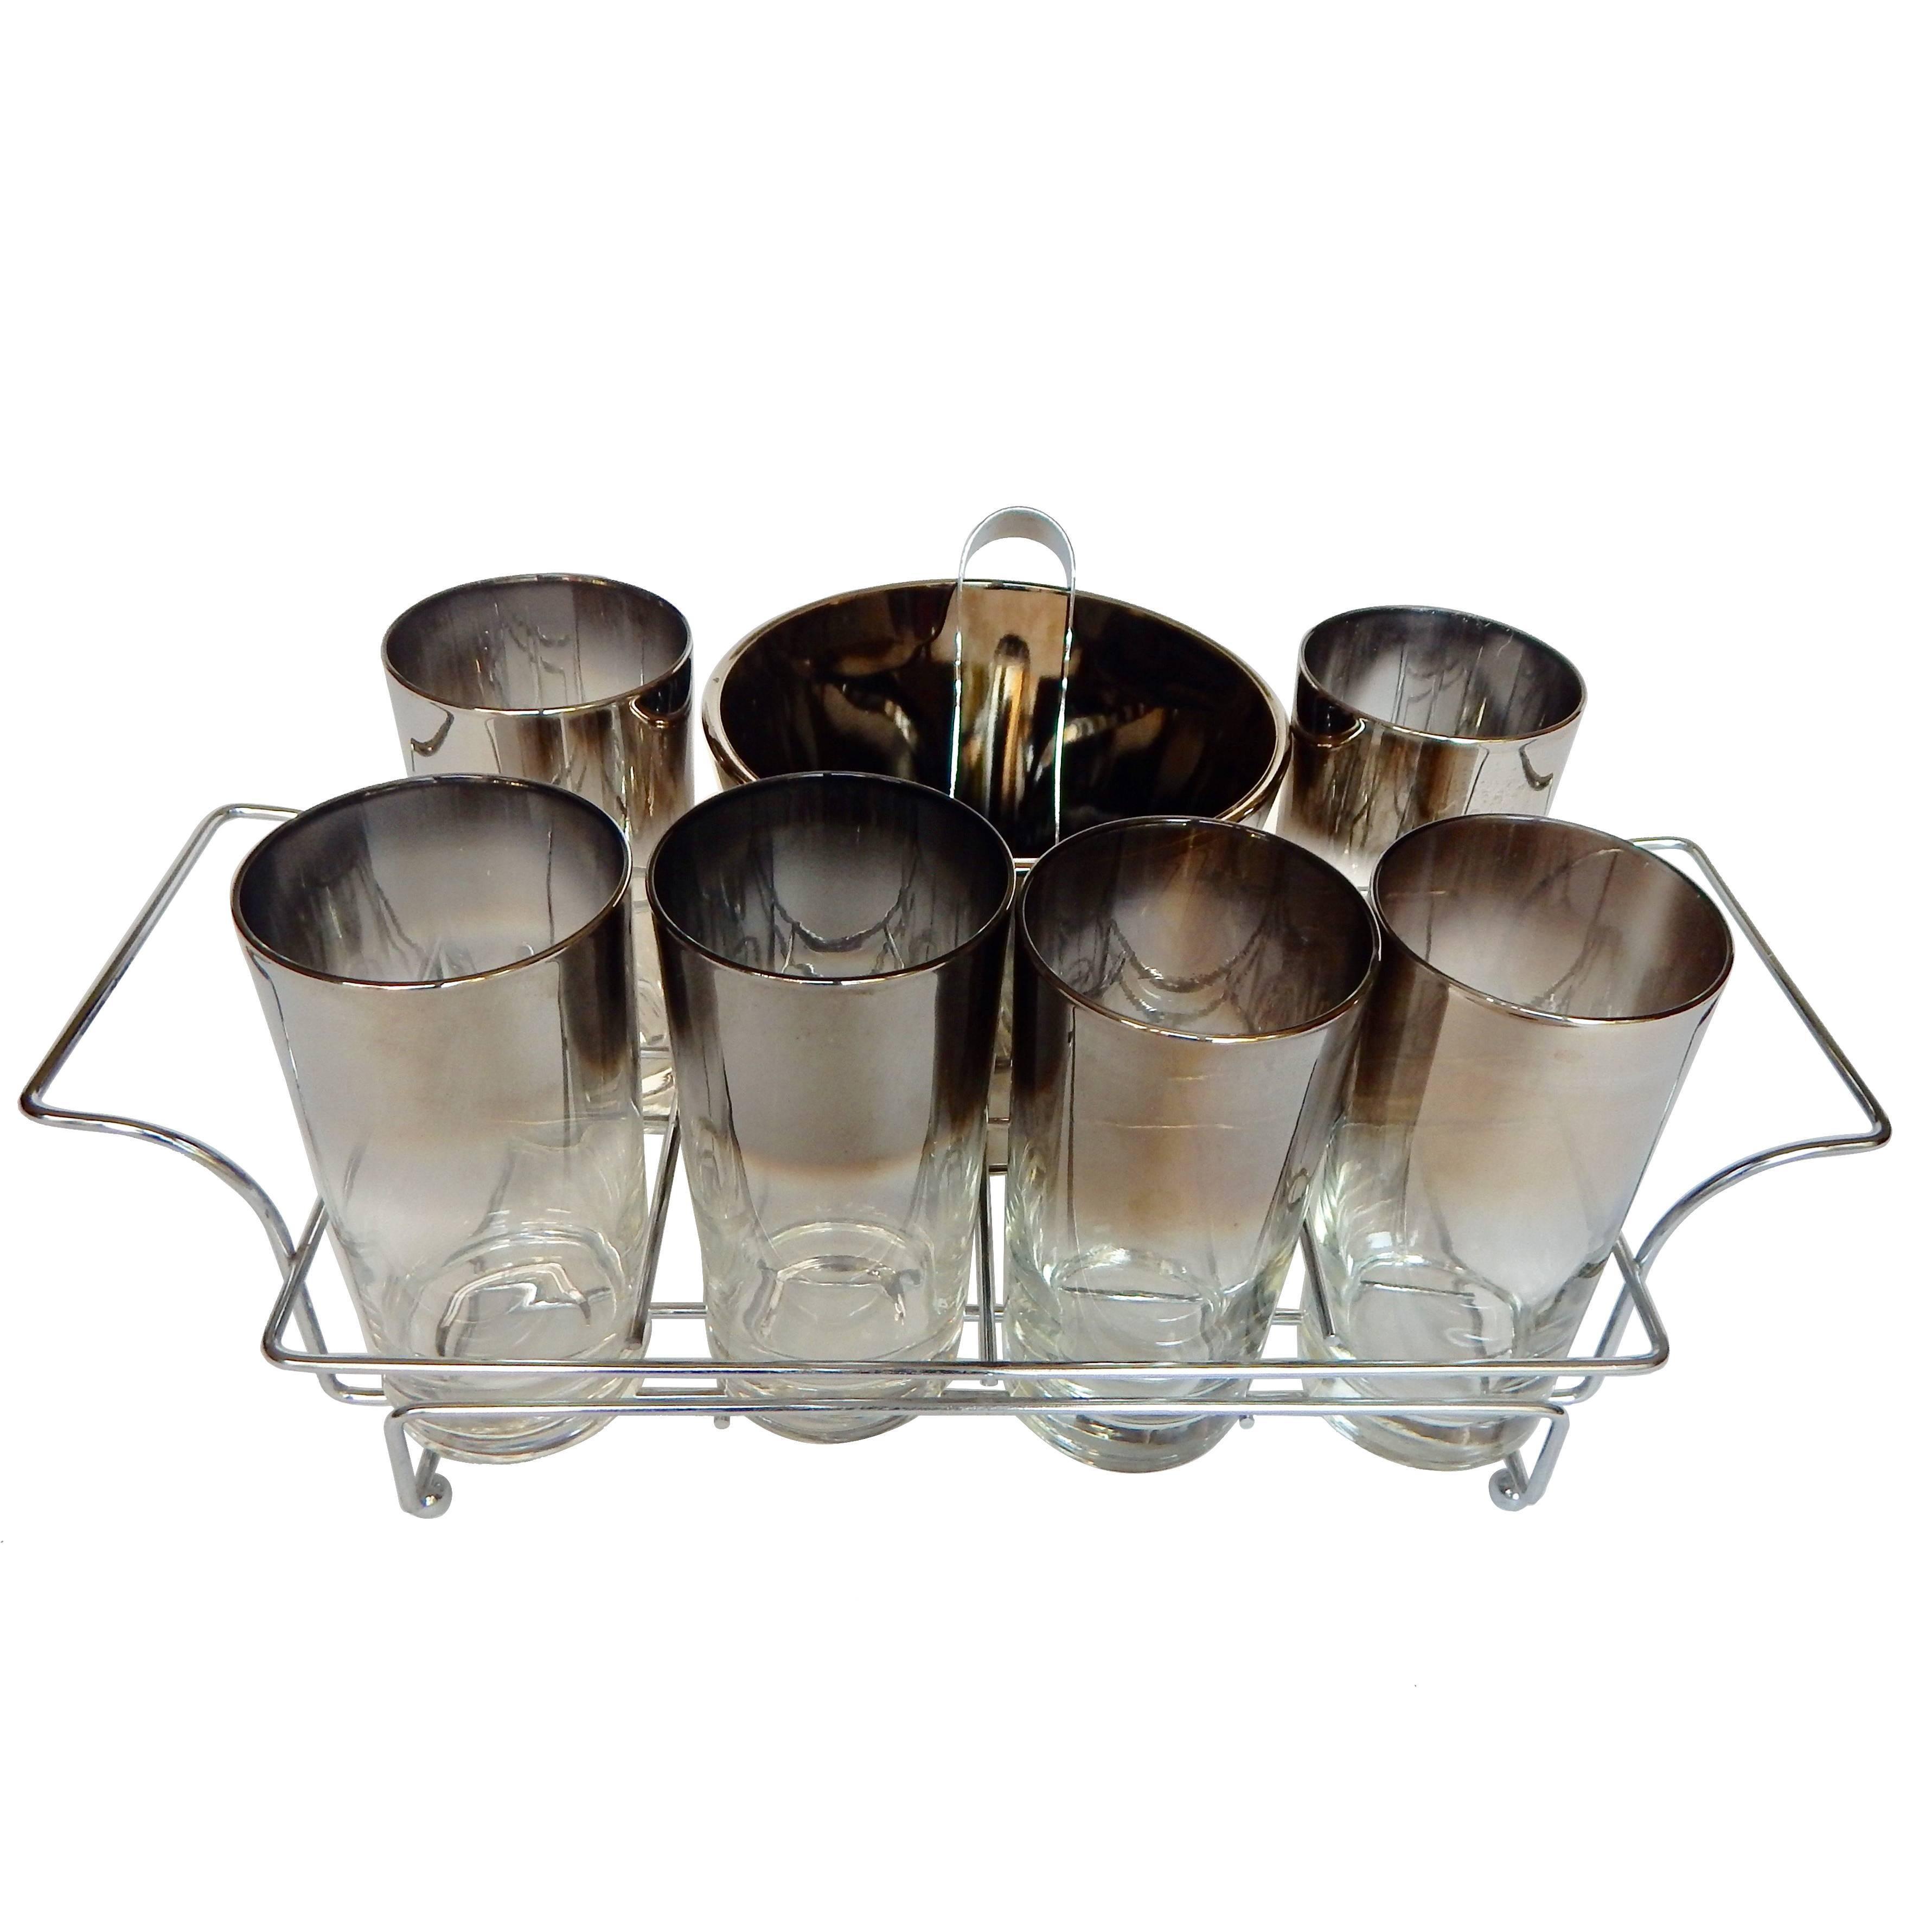 Dorothy Thorpe 1960s Midcentury Glassware or Barware  Set